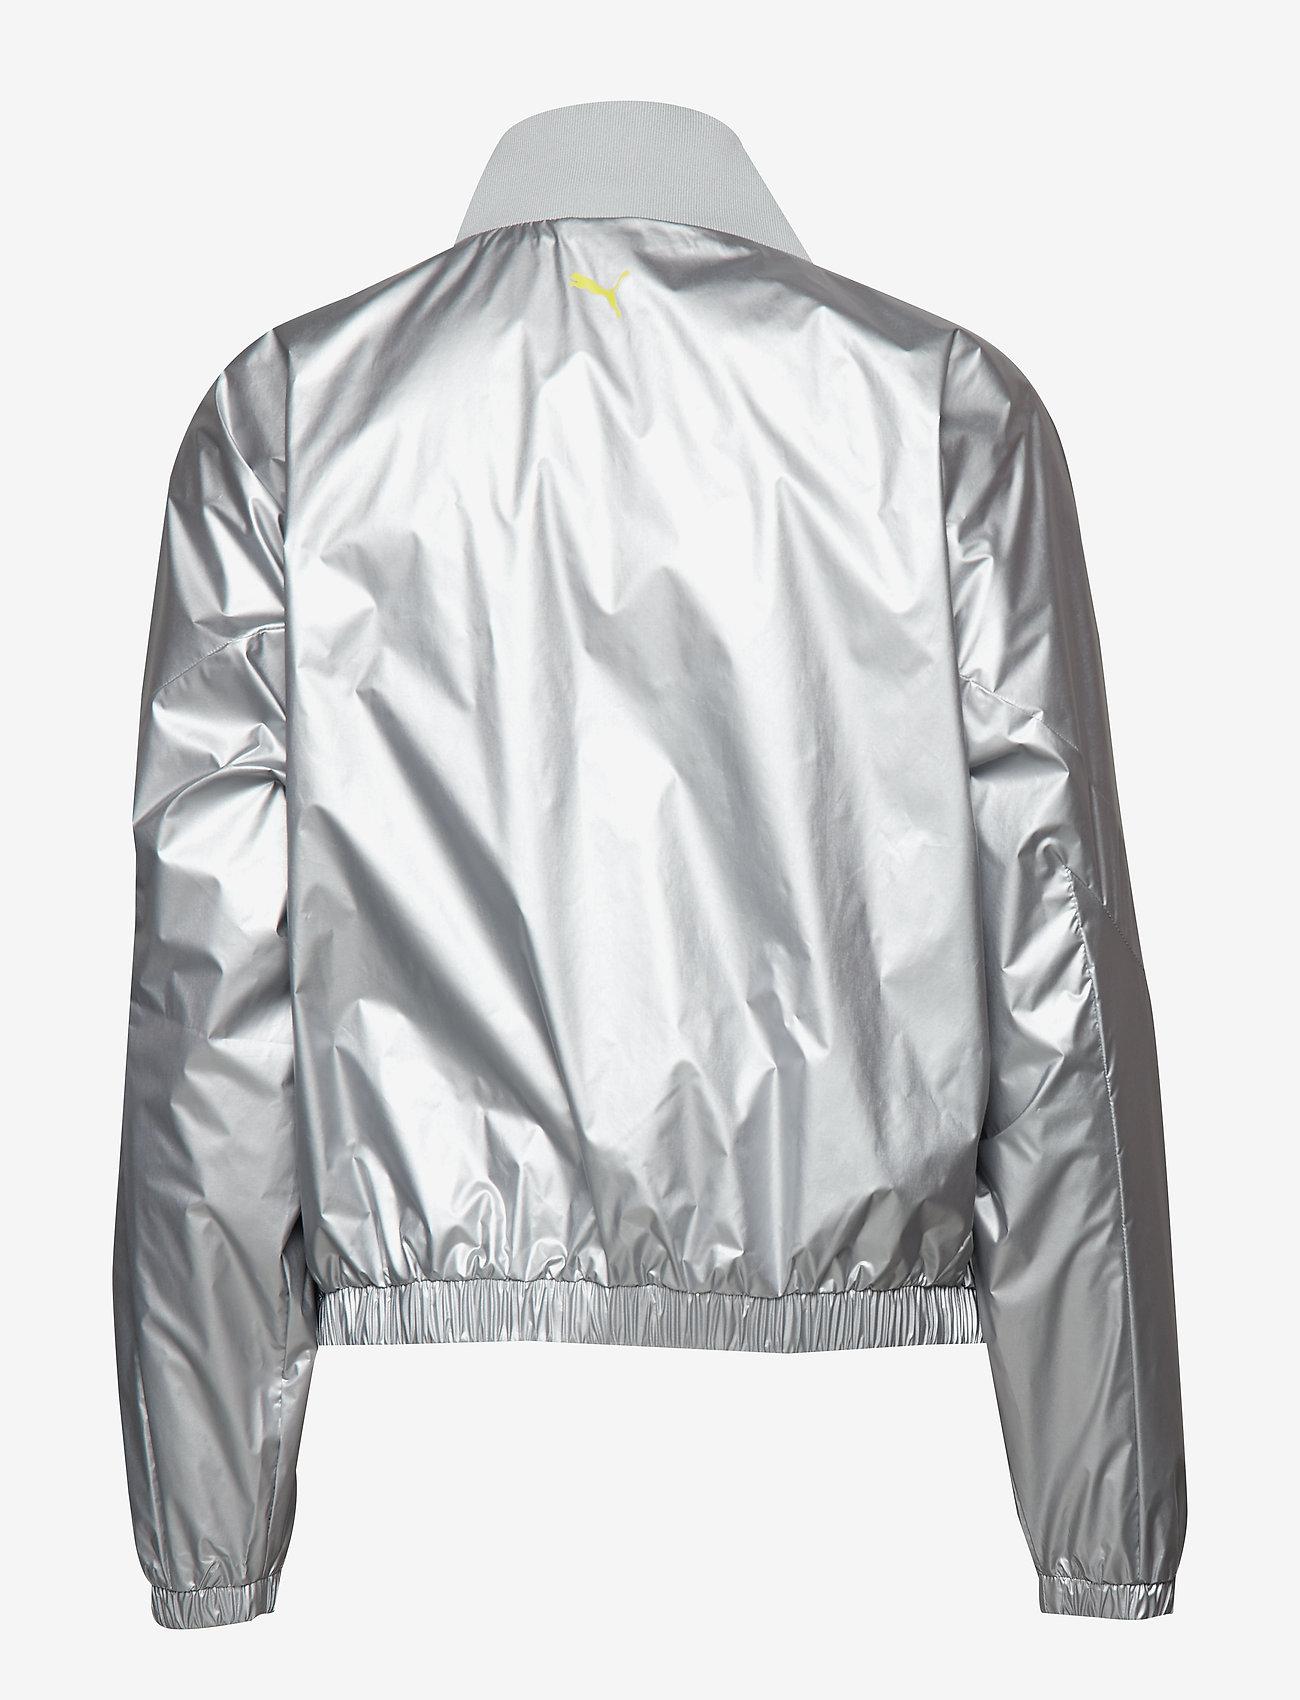 Tz Jacket (Puma White) (360 kr) - PUMA